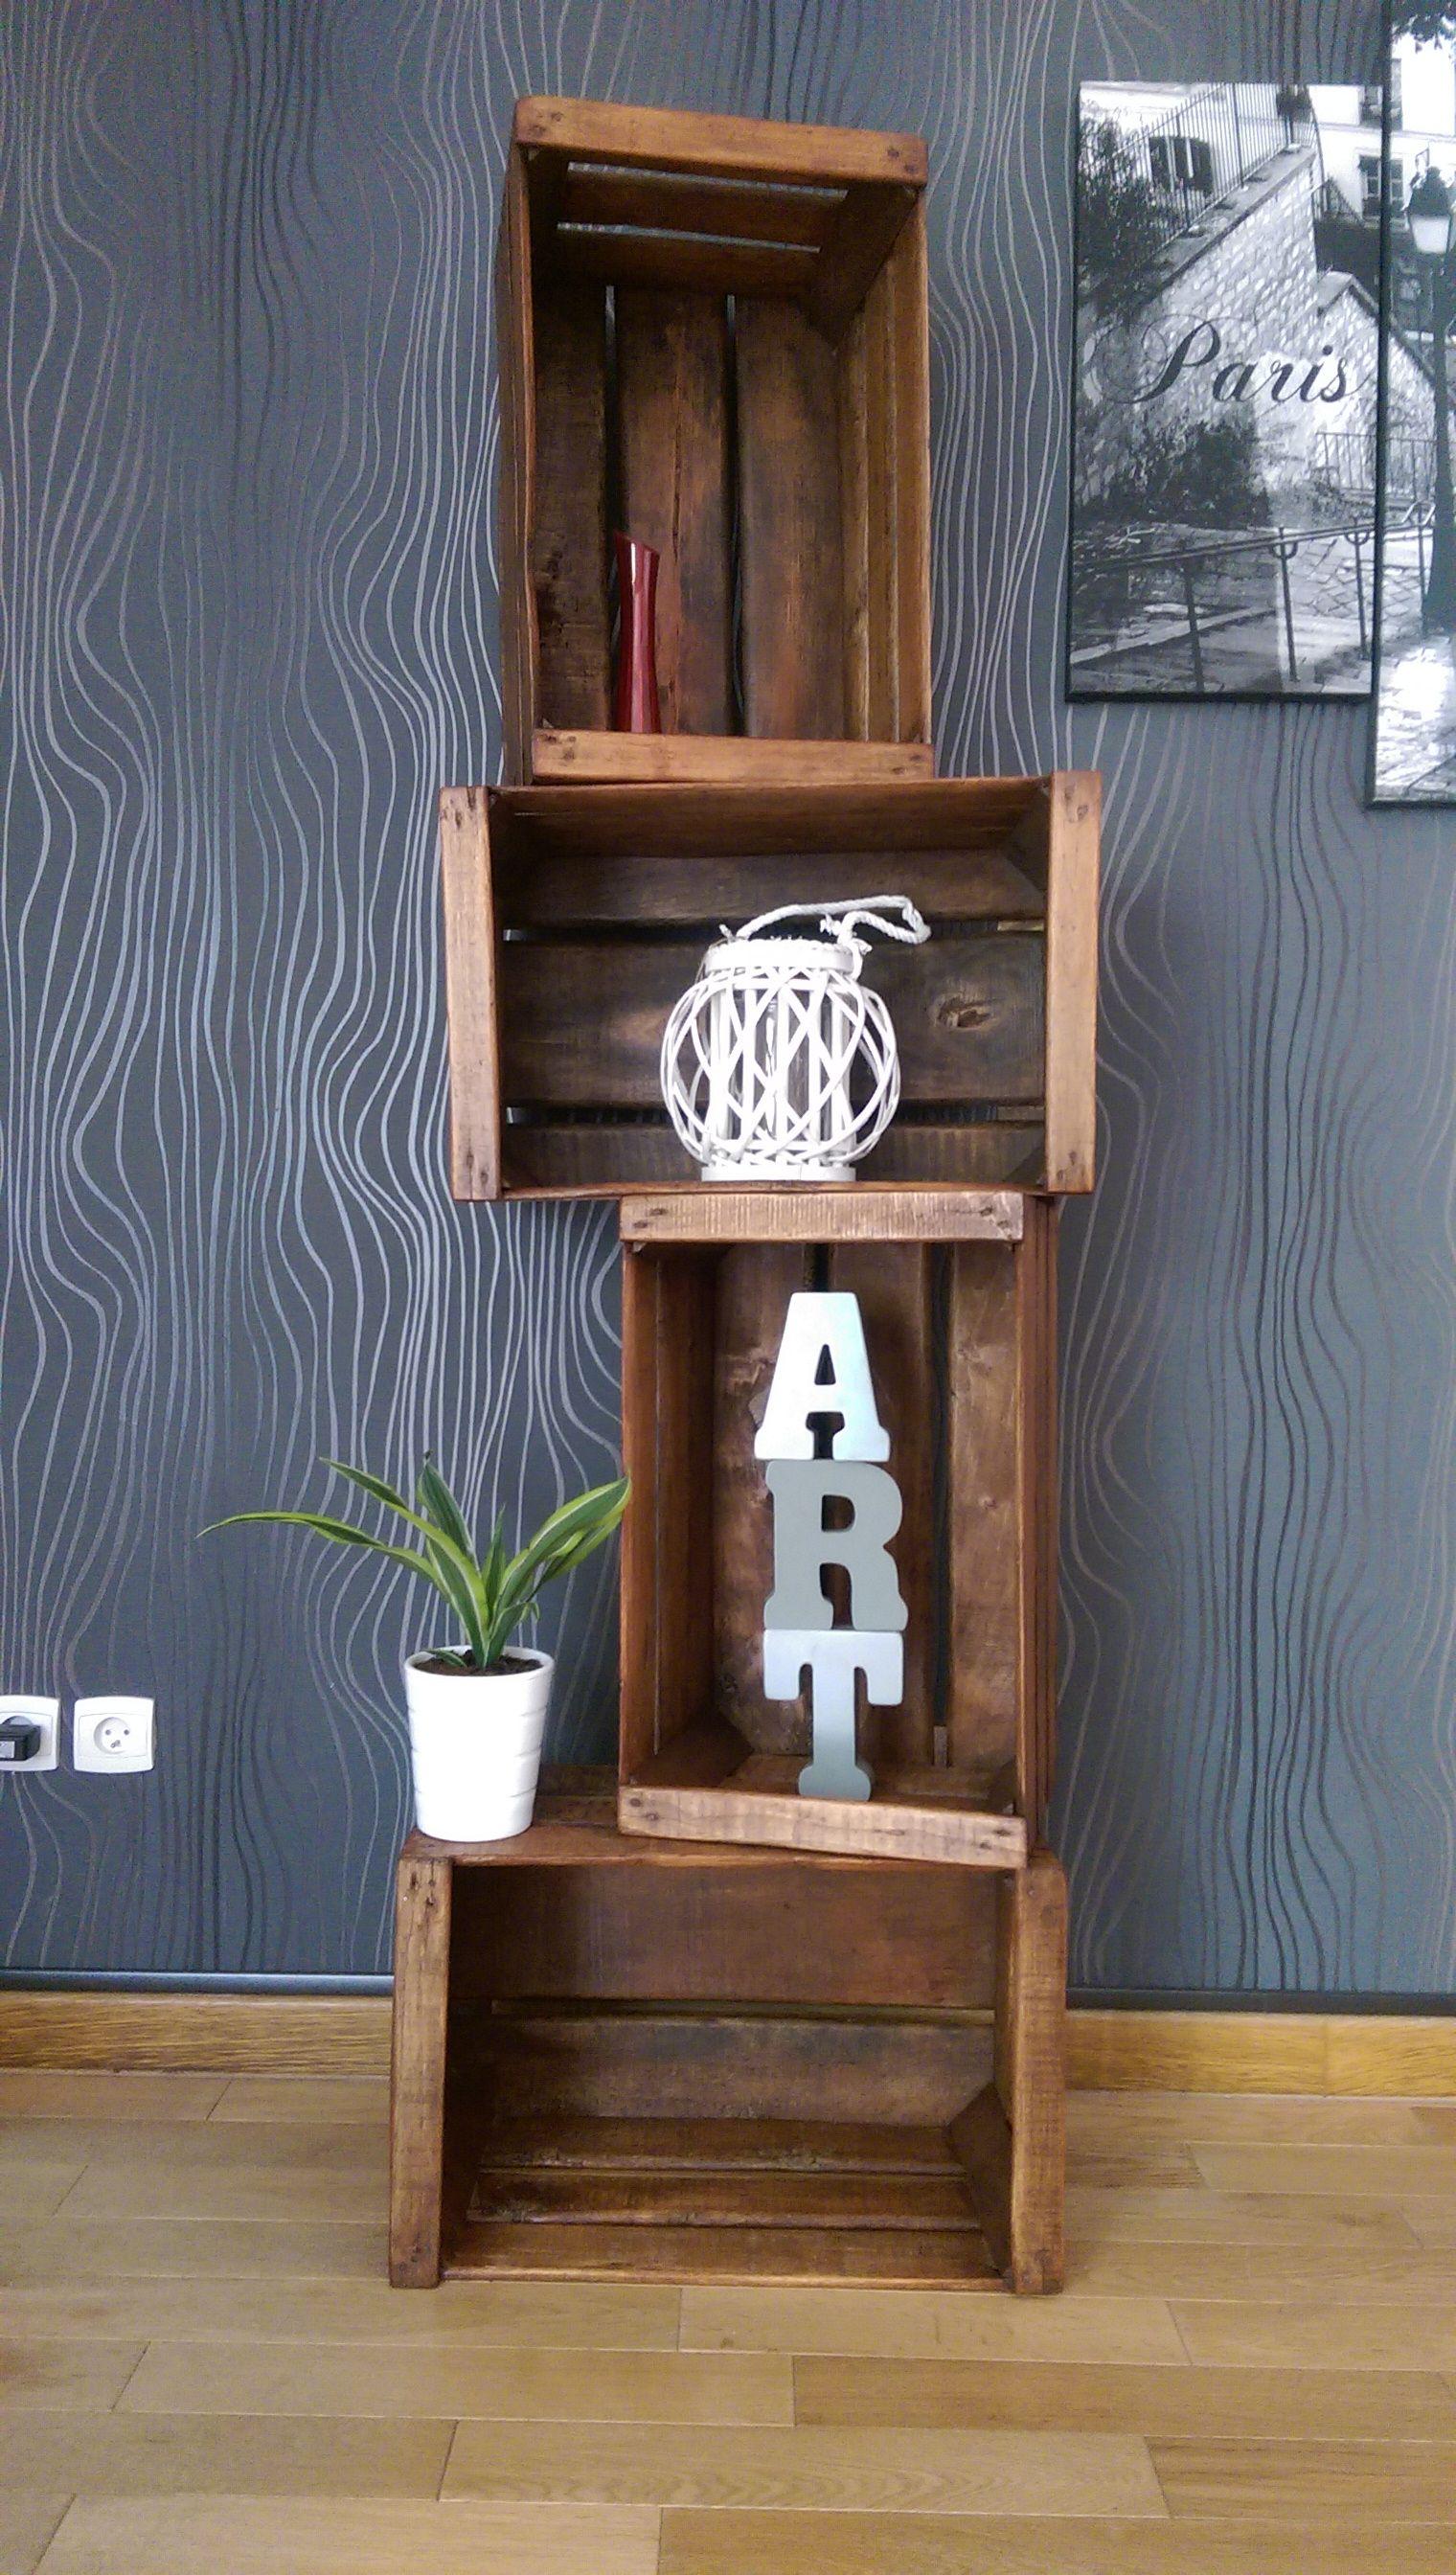 pack d cla 12 9 caisses vin caisse tag re. Black Bedroom Furniture Sets. Home Design Ideas